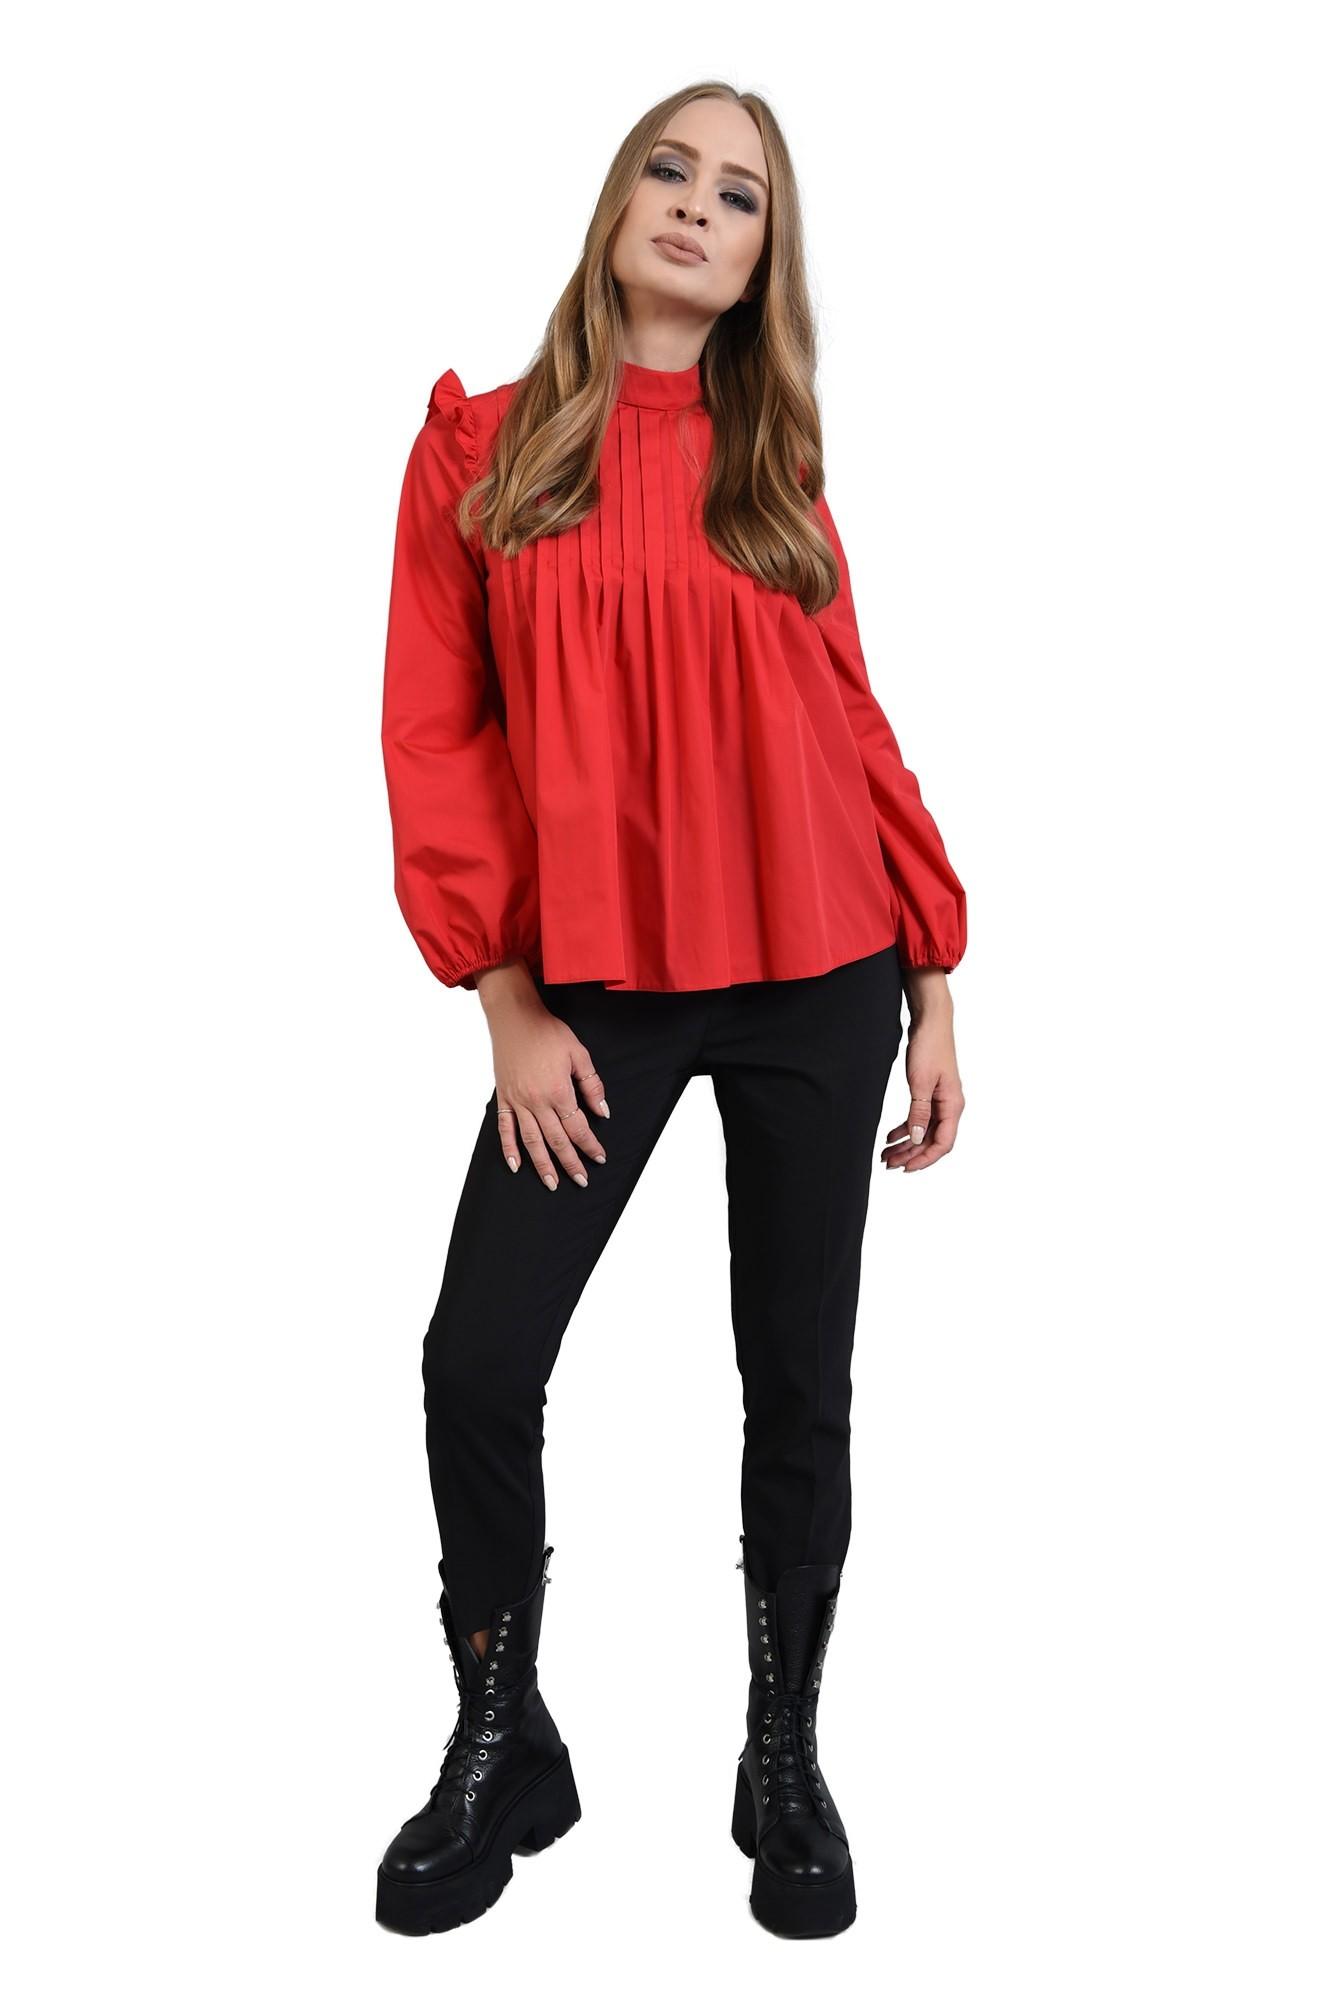 3 - 360 - bluza rosie din bumbac, cu pliuri si volan, Poema